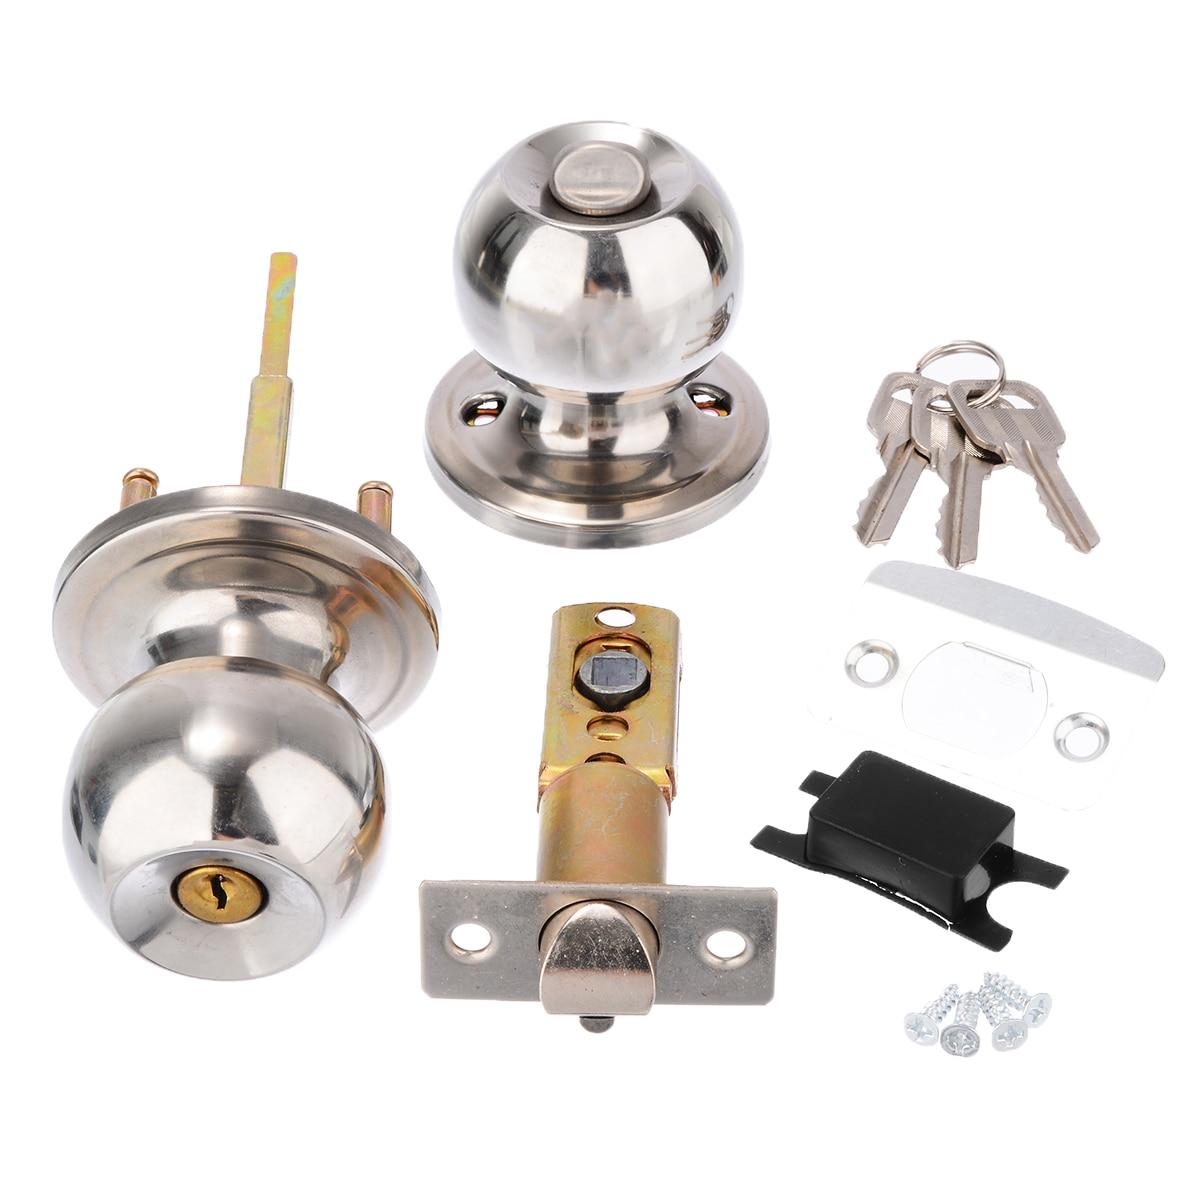 Mayitr Stainless Steel Round Ball Door Knobs Handles Passage Entrance Lock Latch Set For Home Bathroom Door Hardware in Doorknobs from Home Improvement